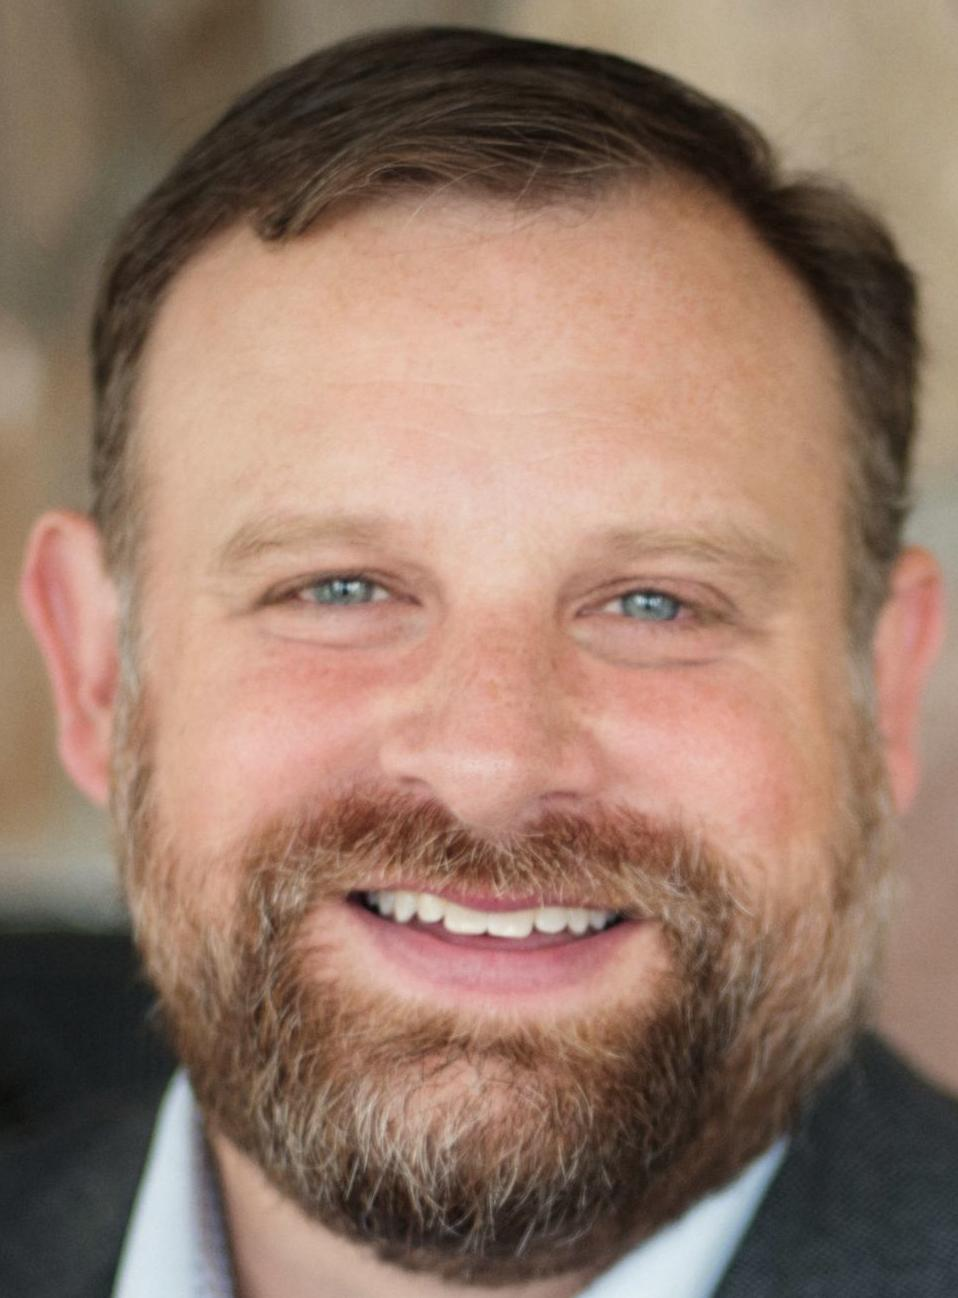 Mayor Cory Mason